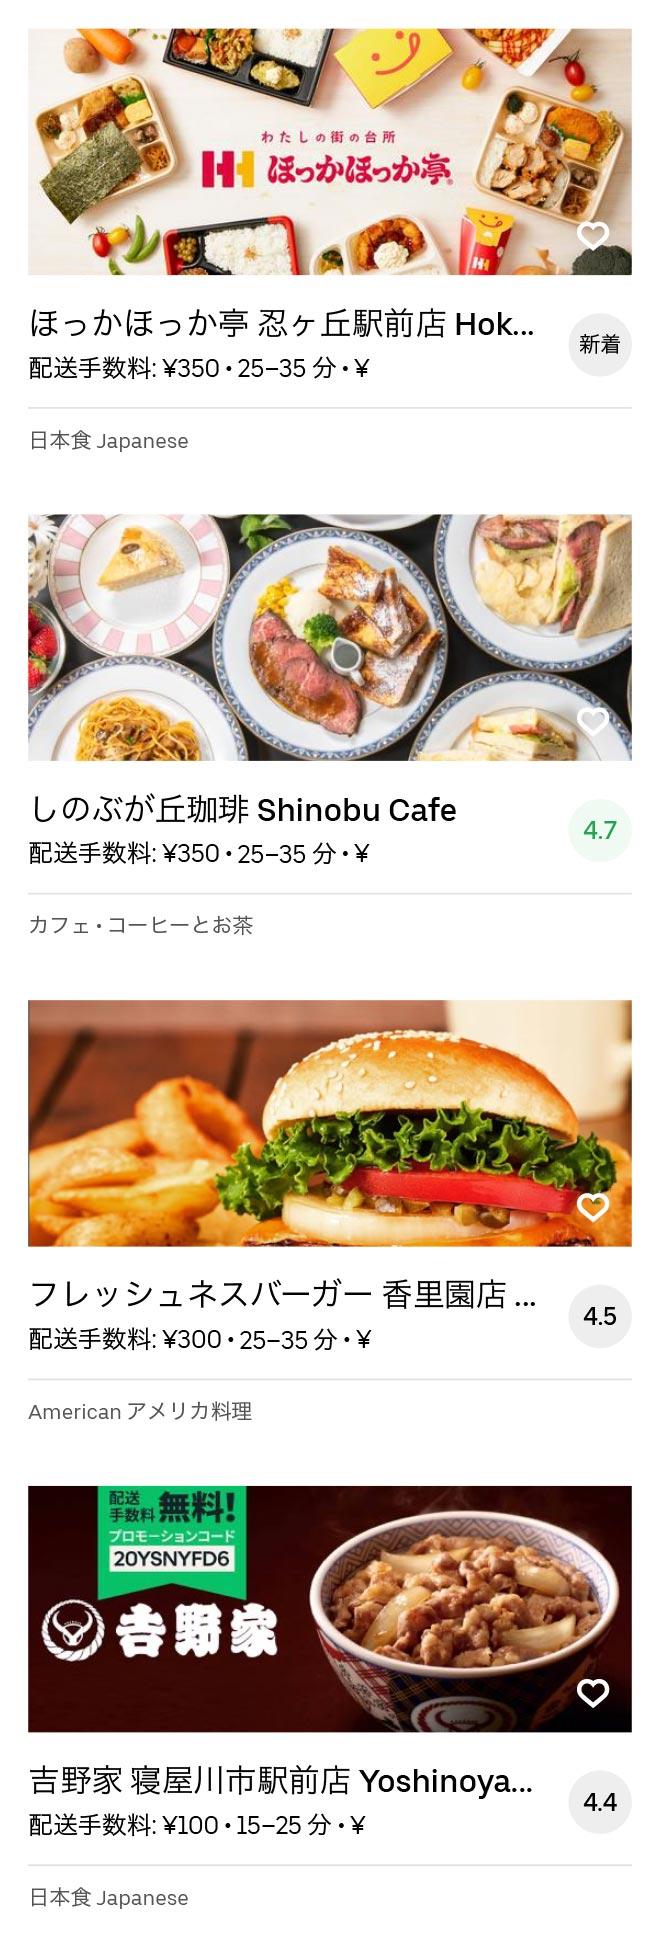 Neyagawa shi menu 2006 04